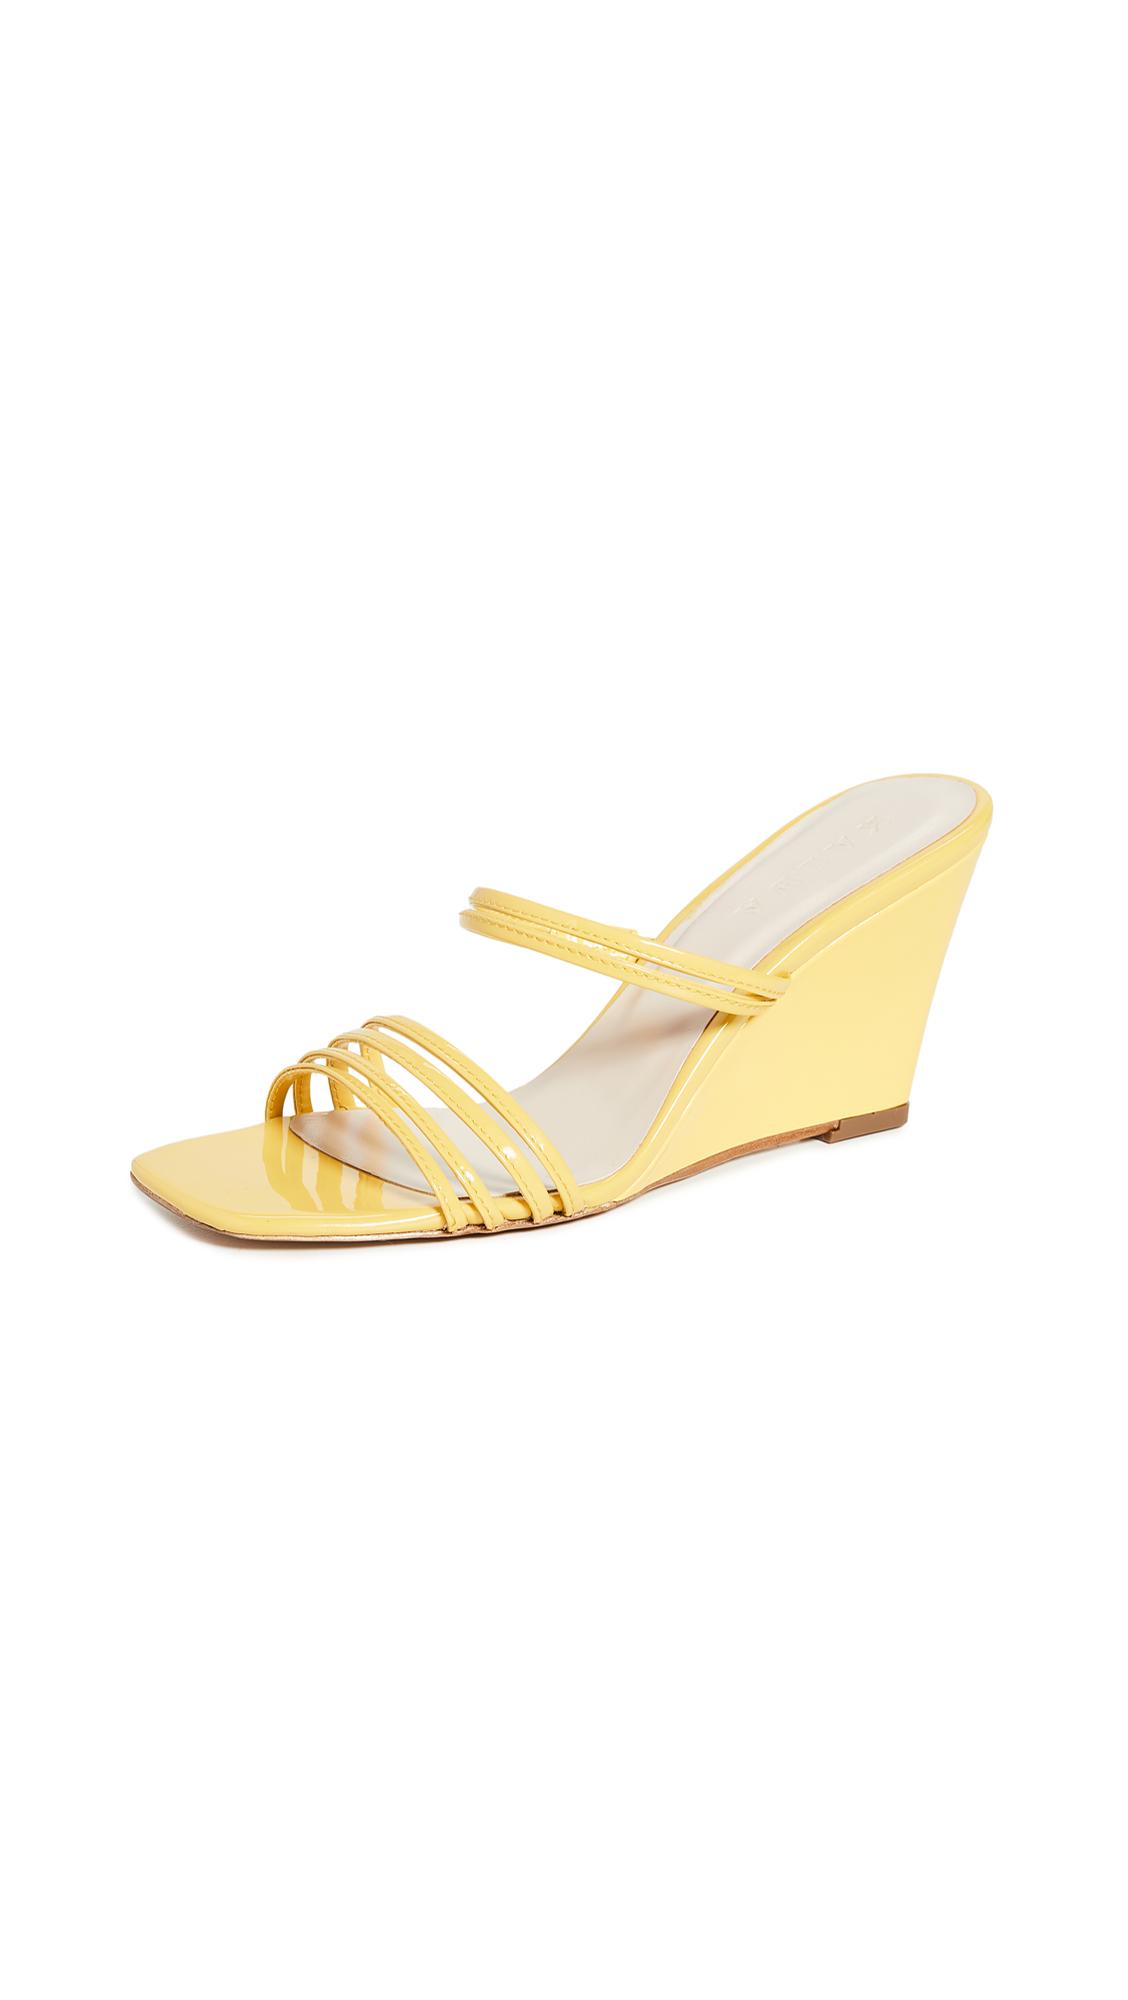 Buy Kalda Simon Wedge Sandals online, shop Kalda